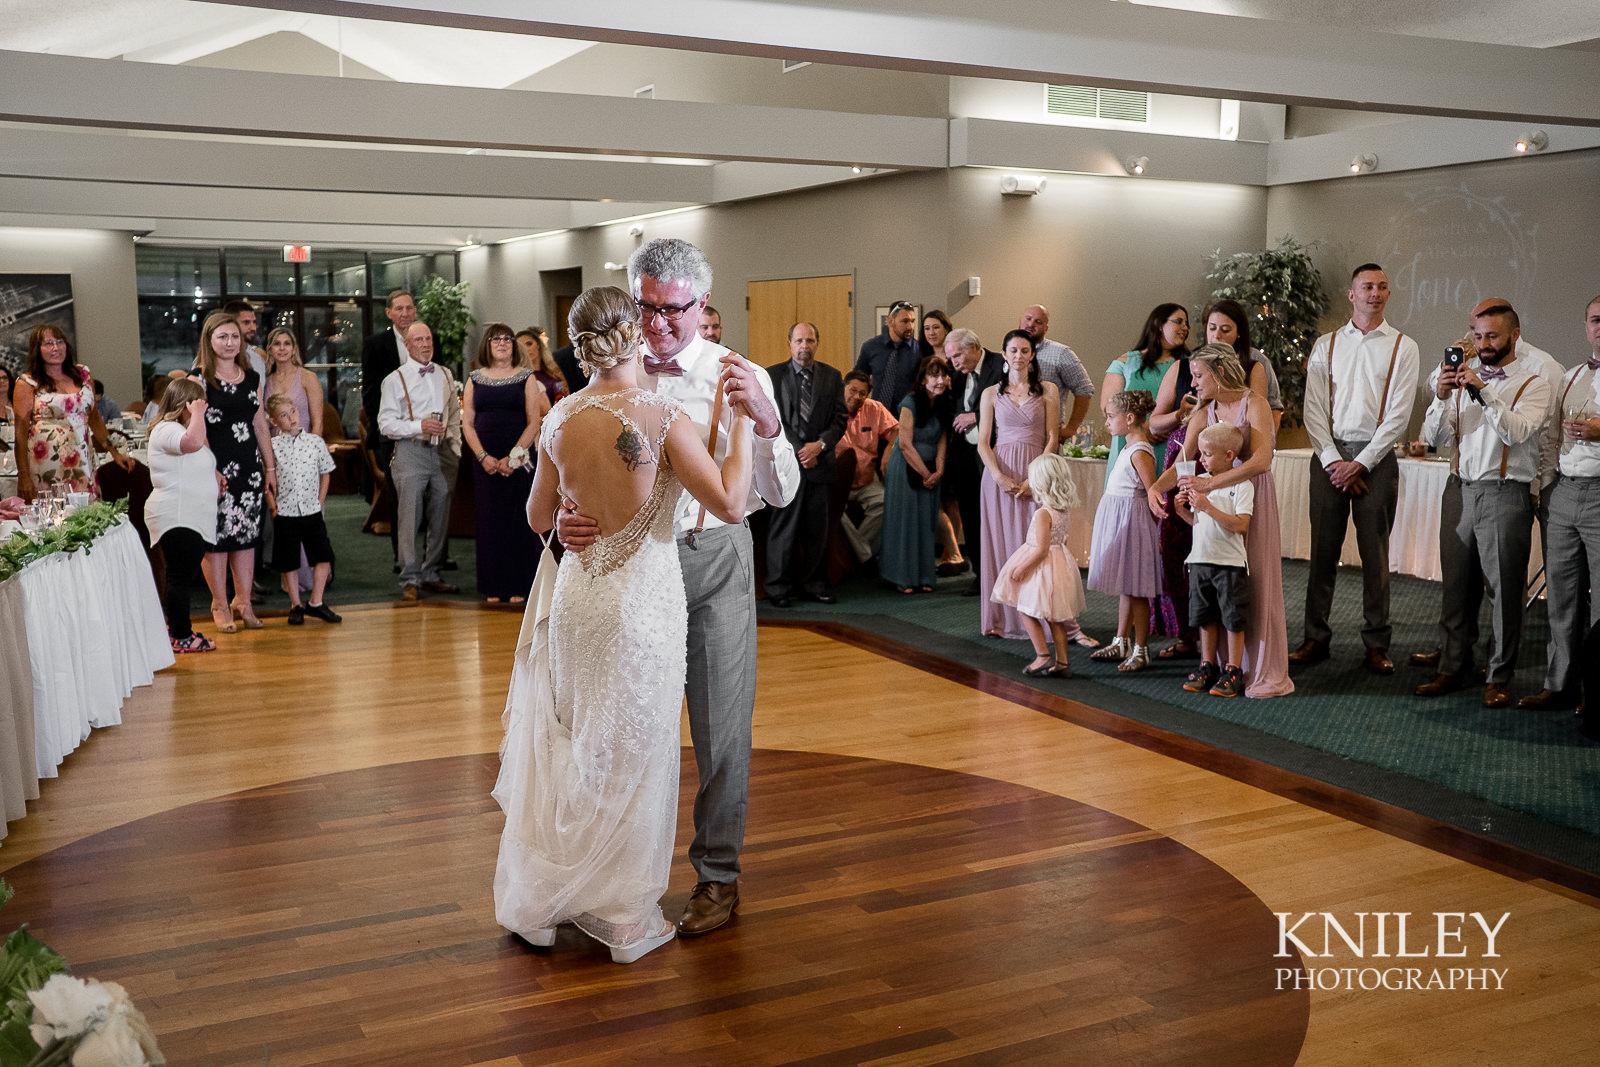 101 - Ontario Golf Club Wedding Pictures - XT2A7310.jpg